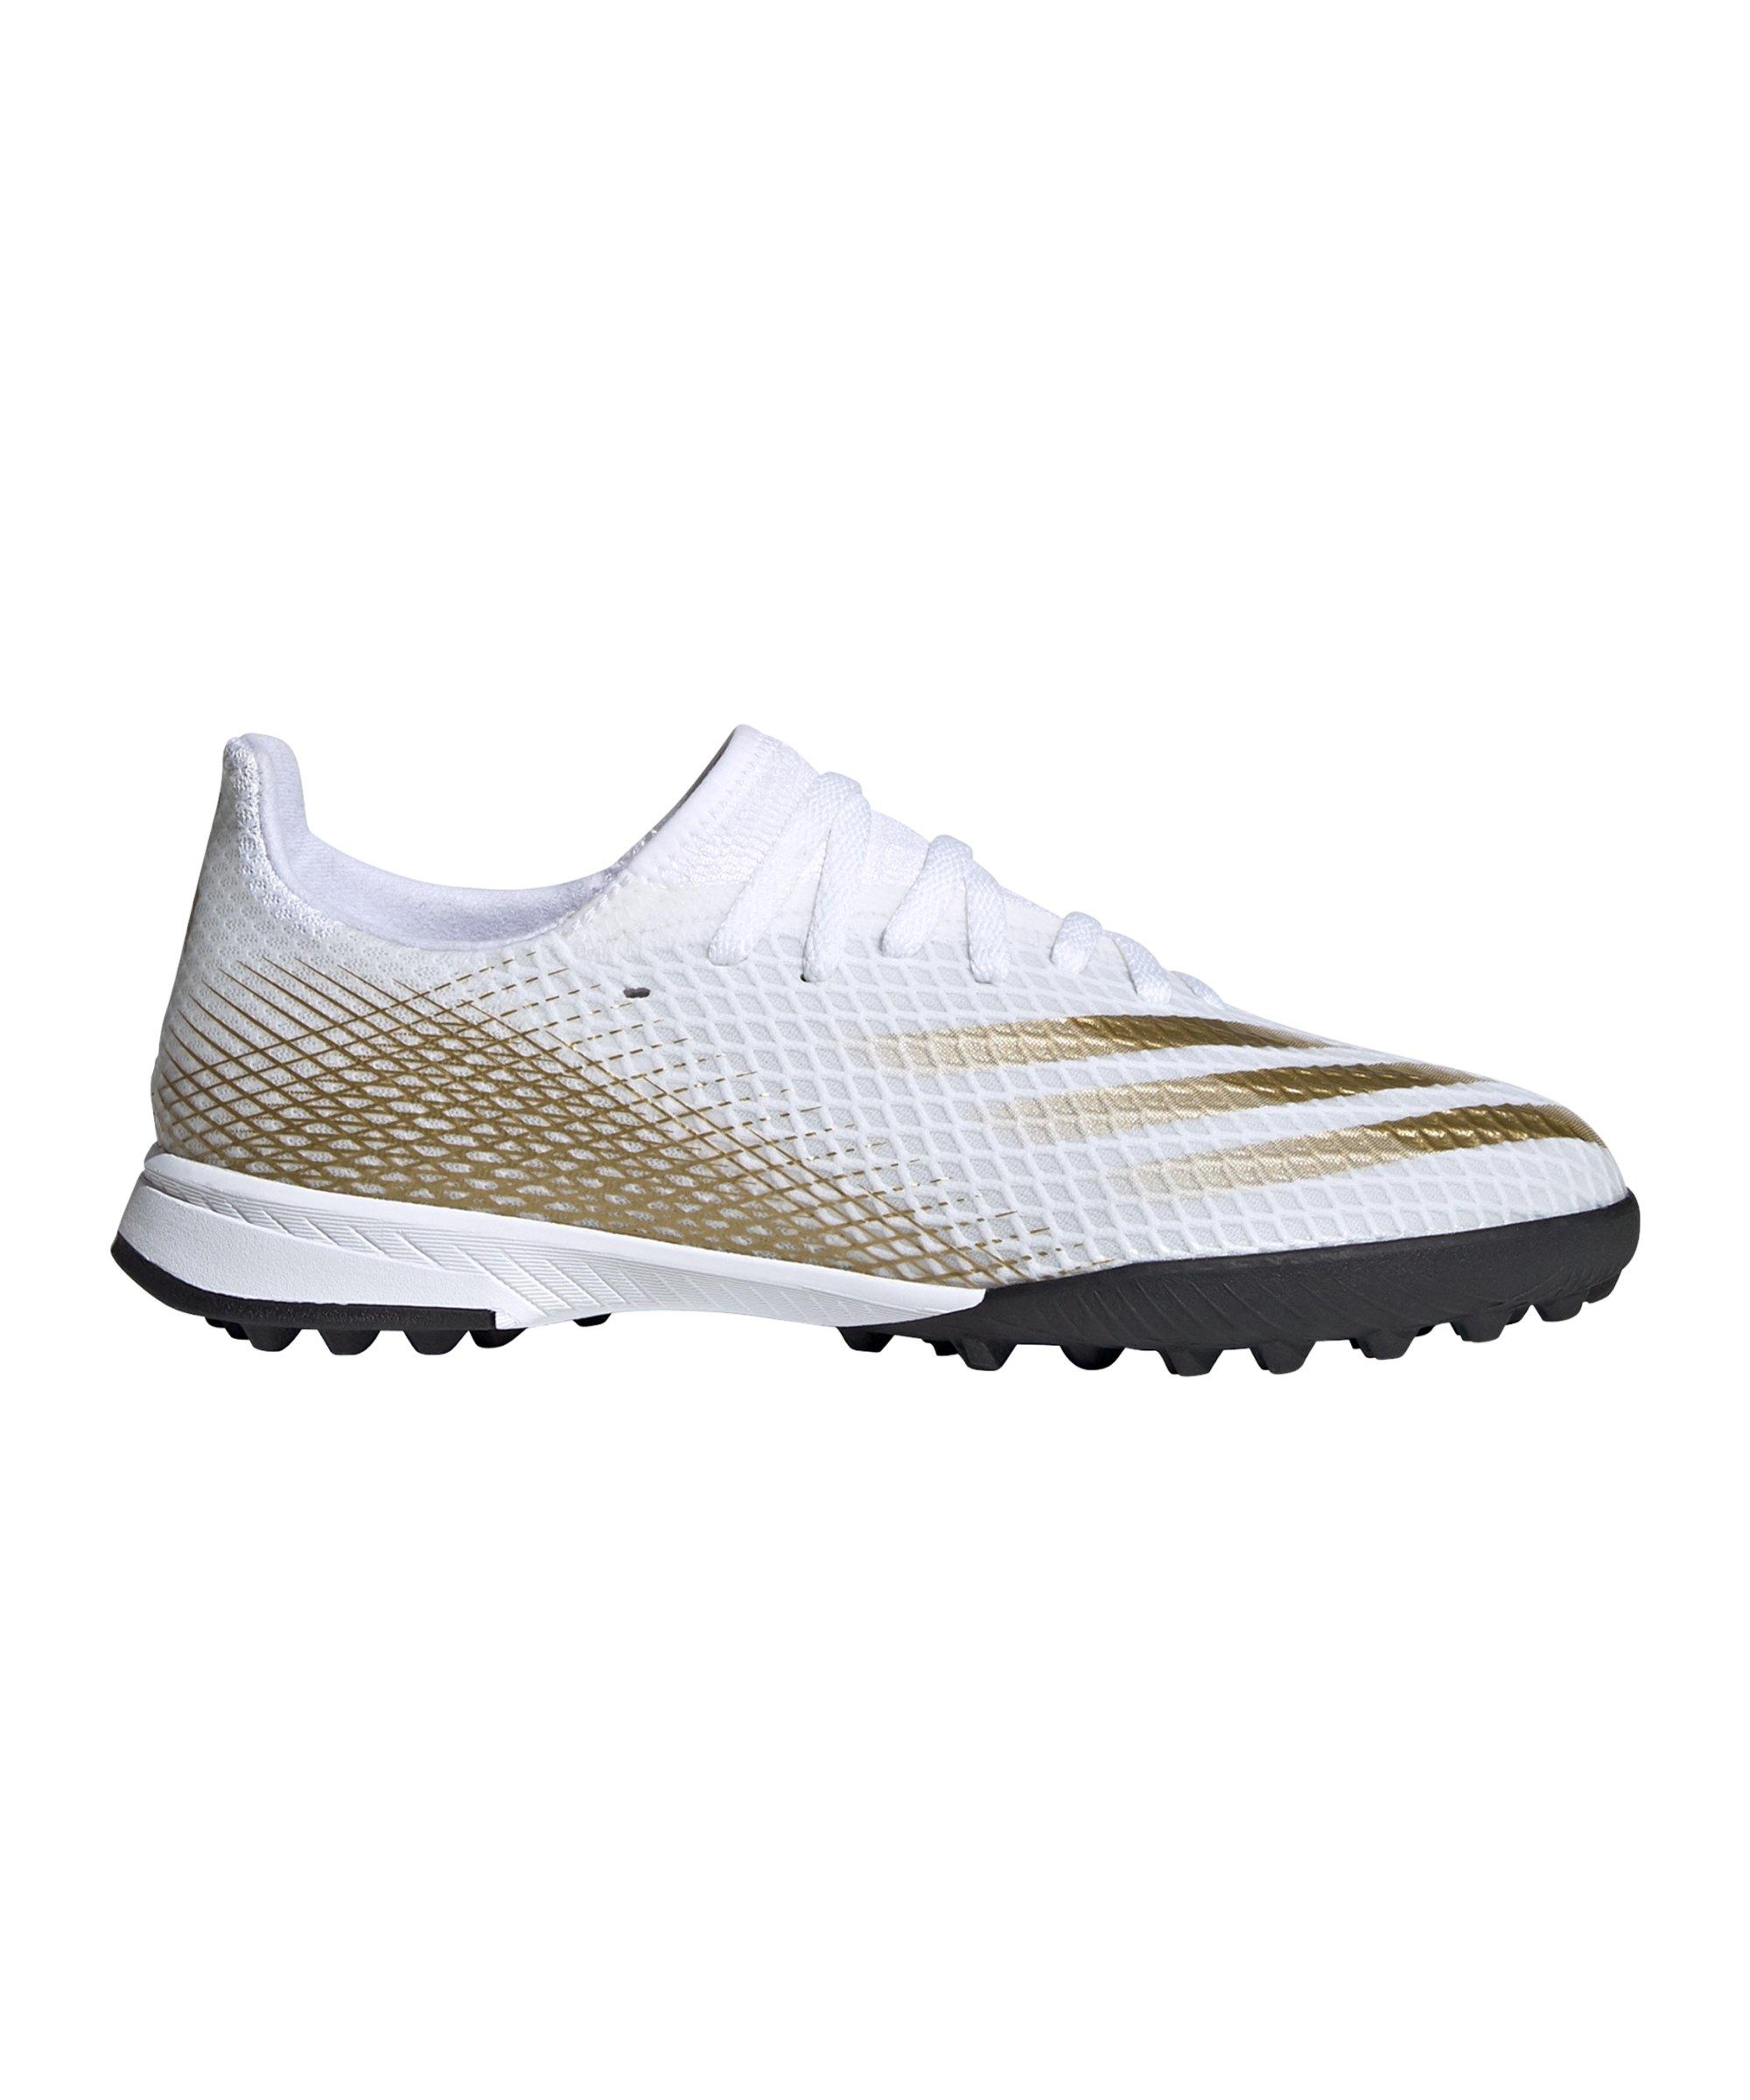 adidas X GHOSTED.3 TF Inflight J Kids Weiss Gold - weiss